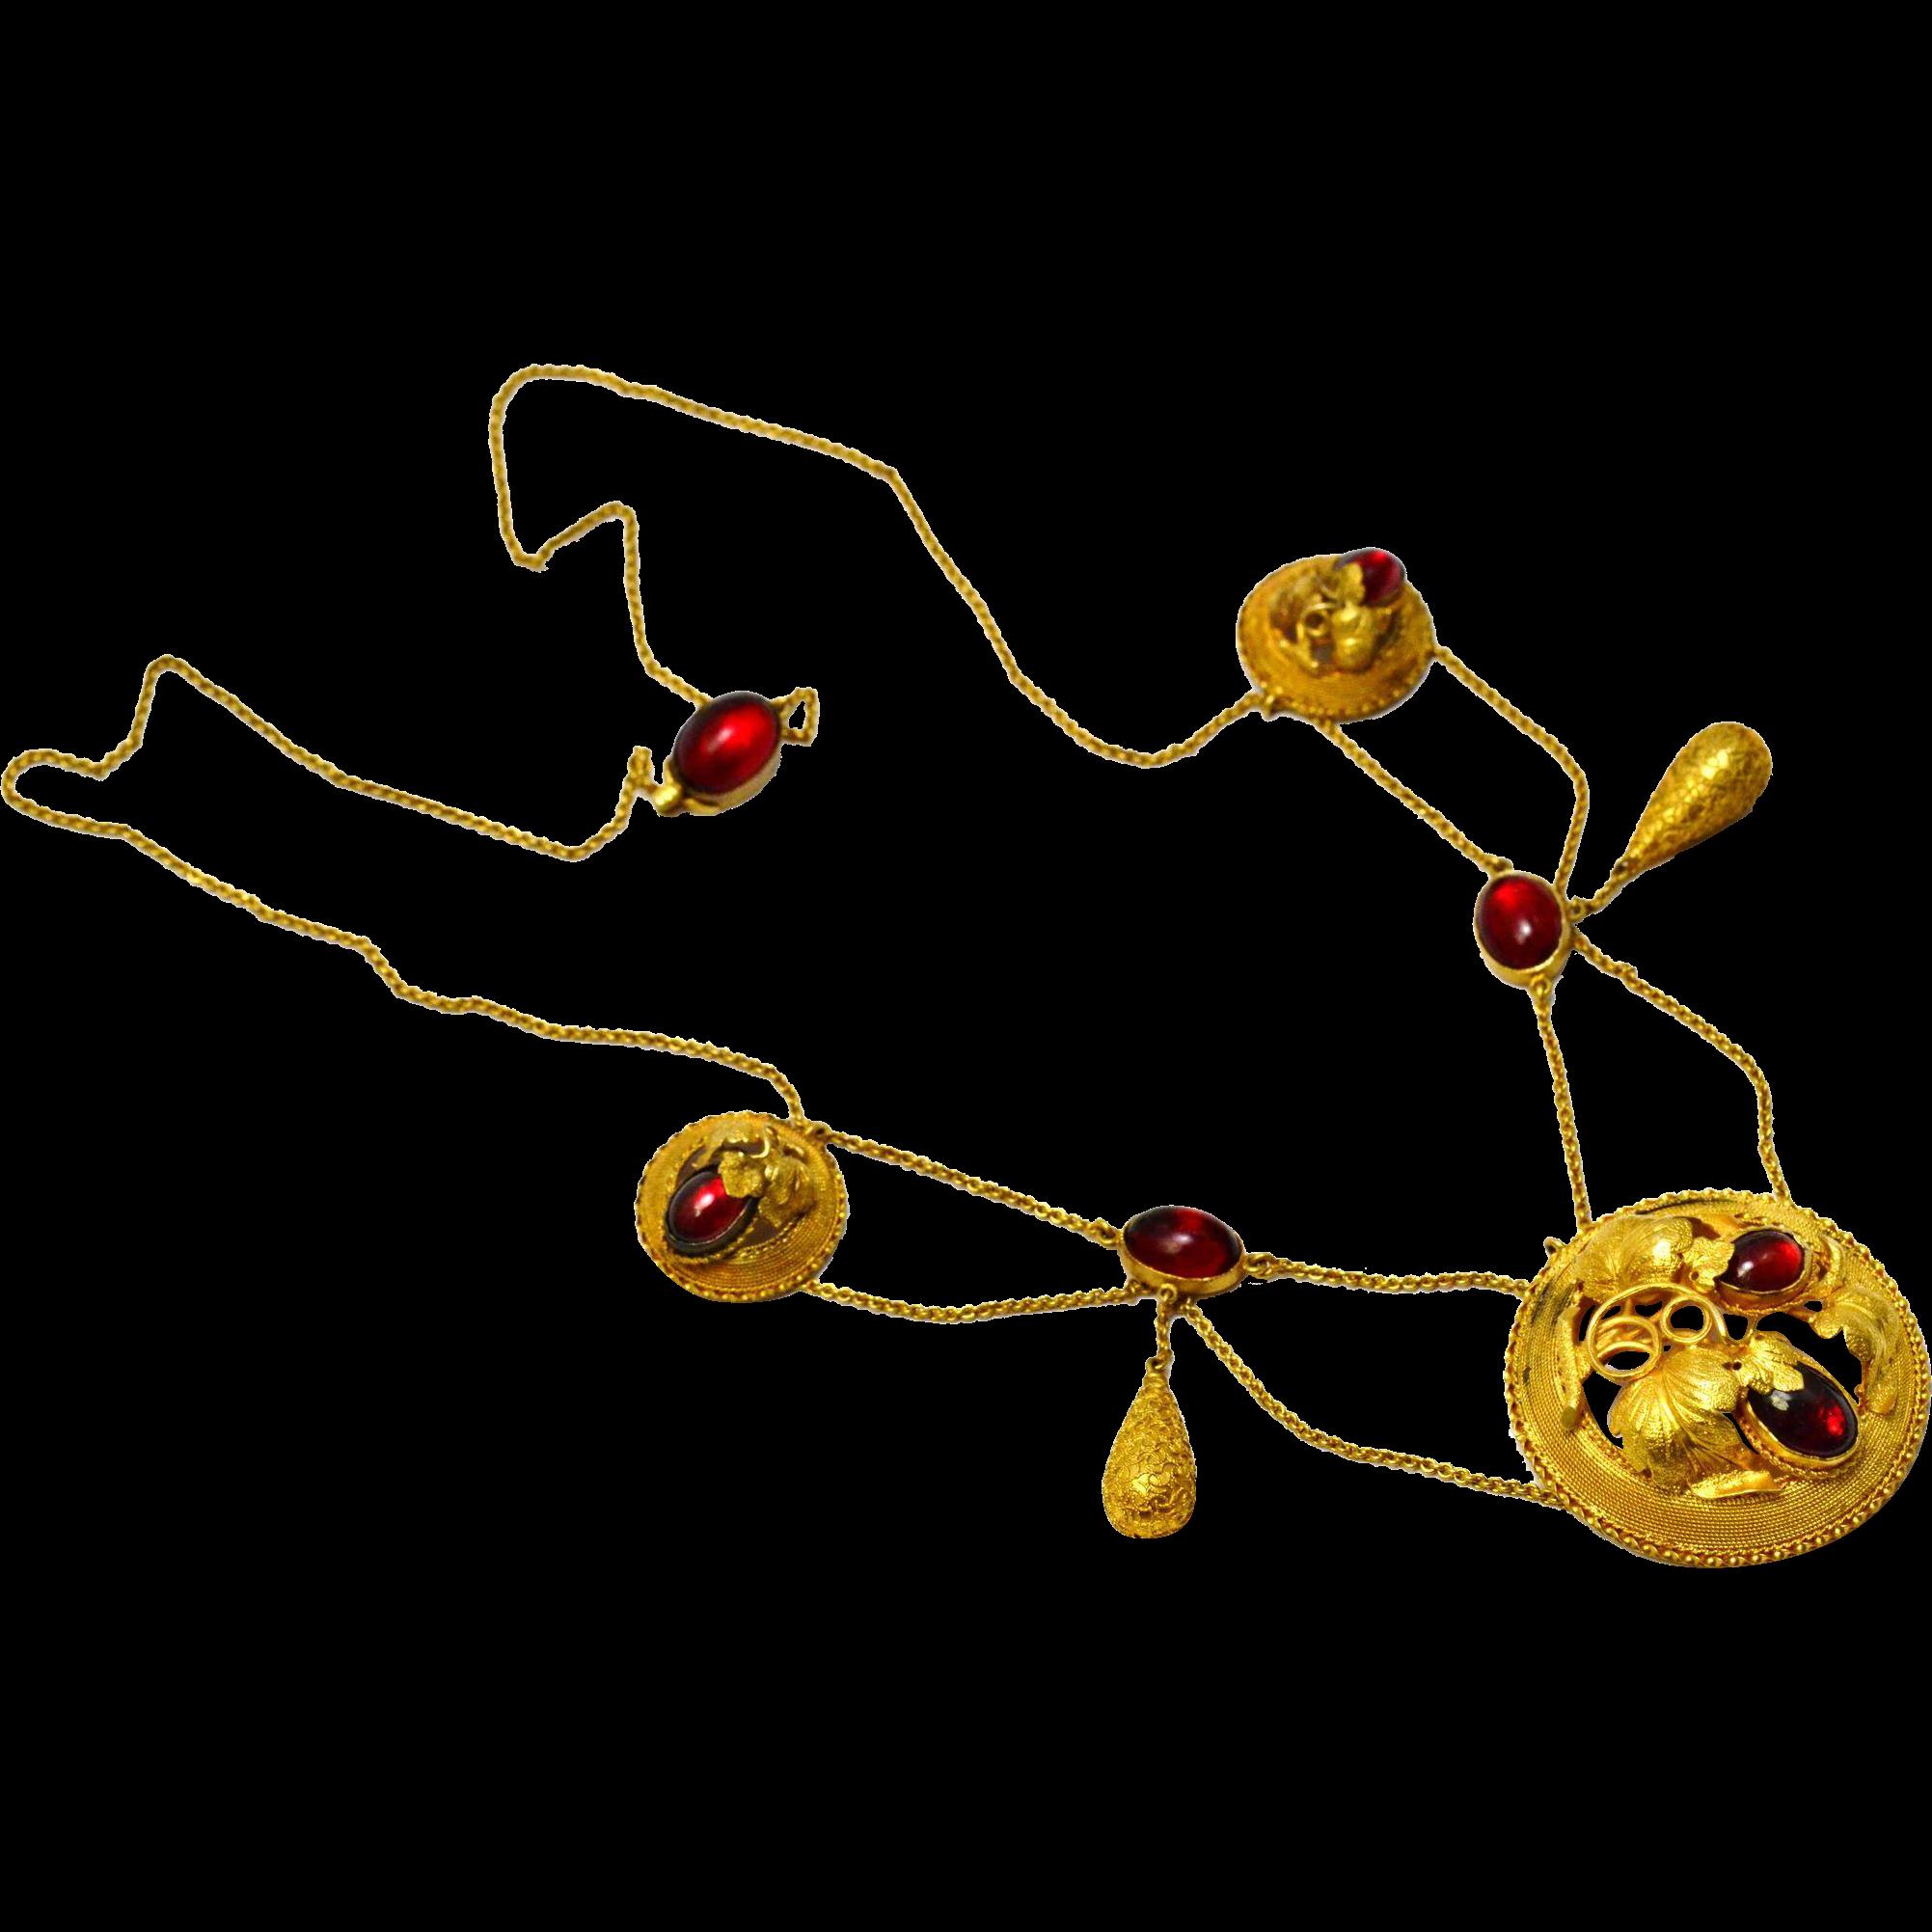 Antique Victorian 14k gold naturalistic garnet paste festoon necklace